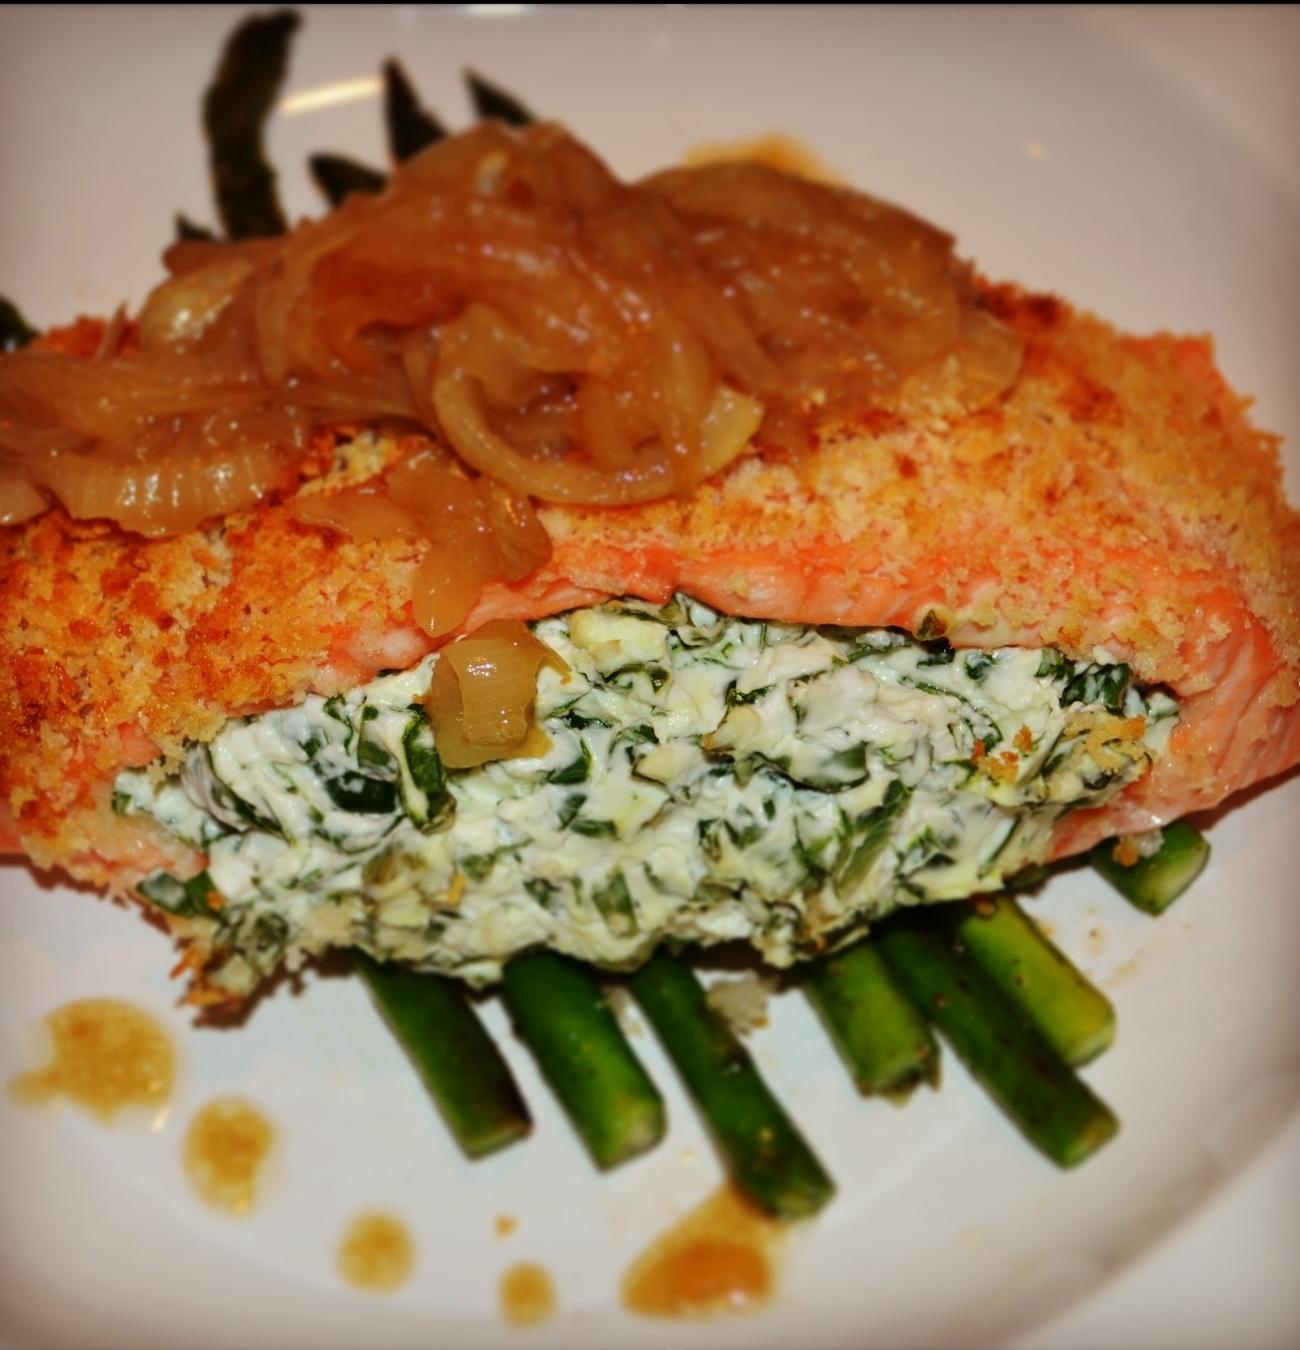 Simply Sensational Stuffed Salmon